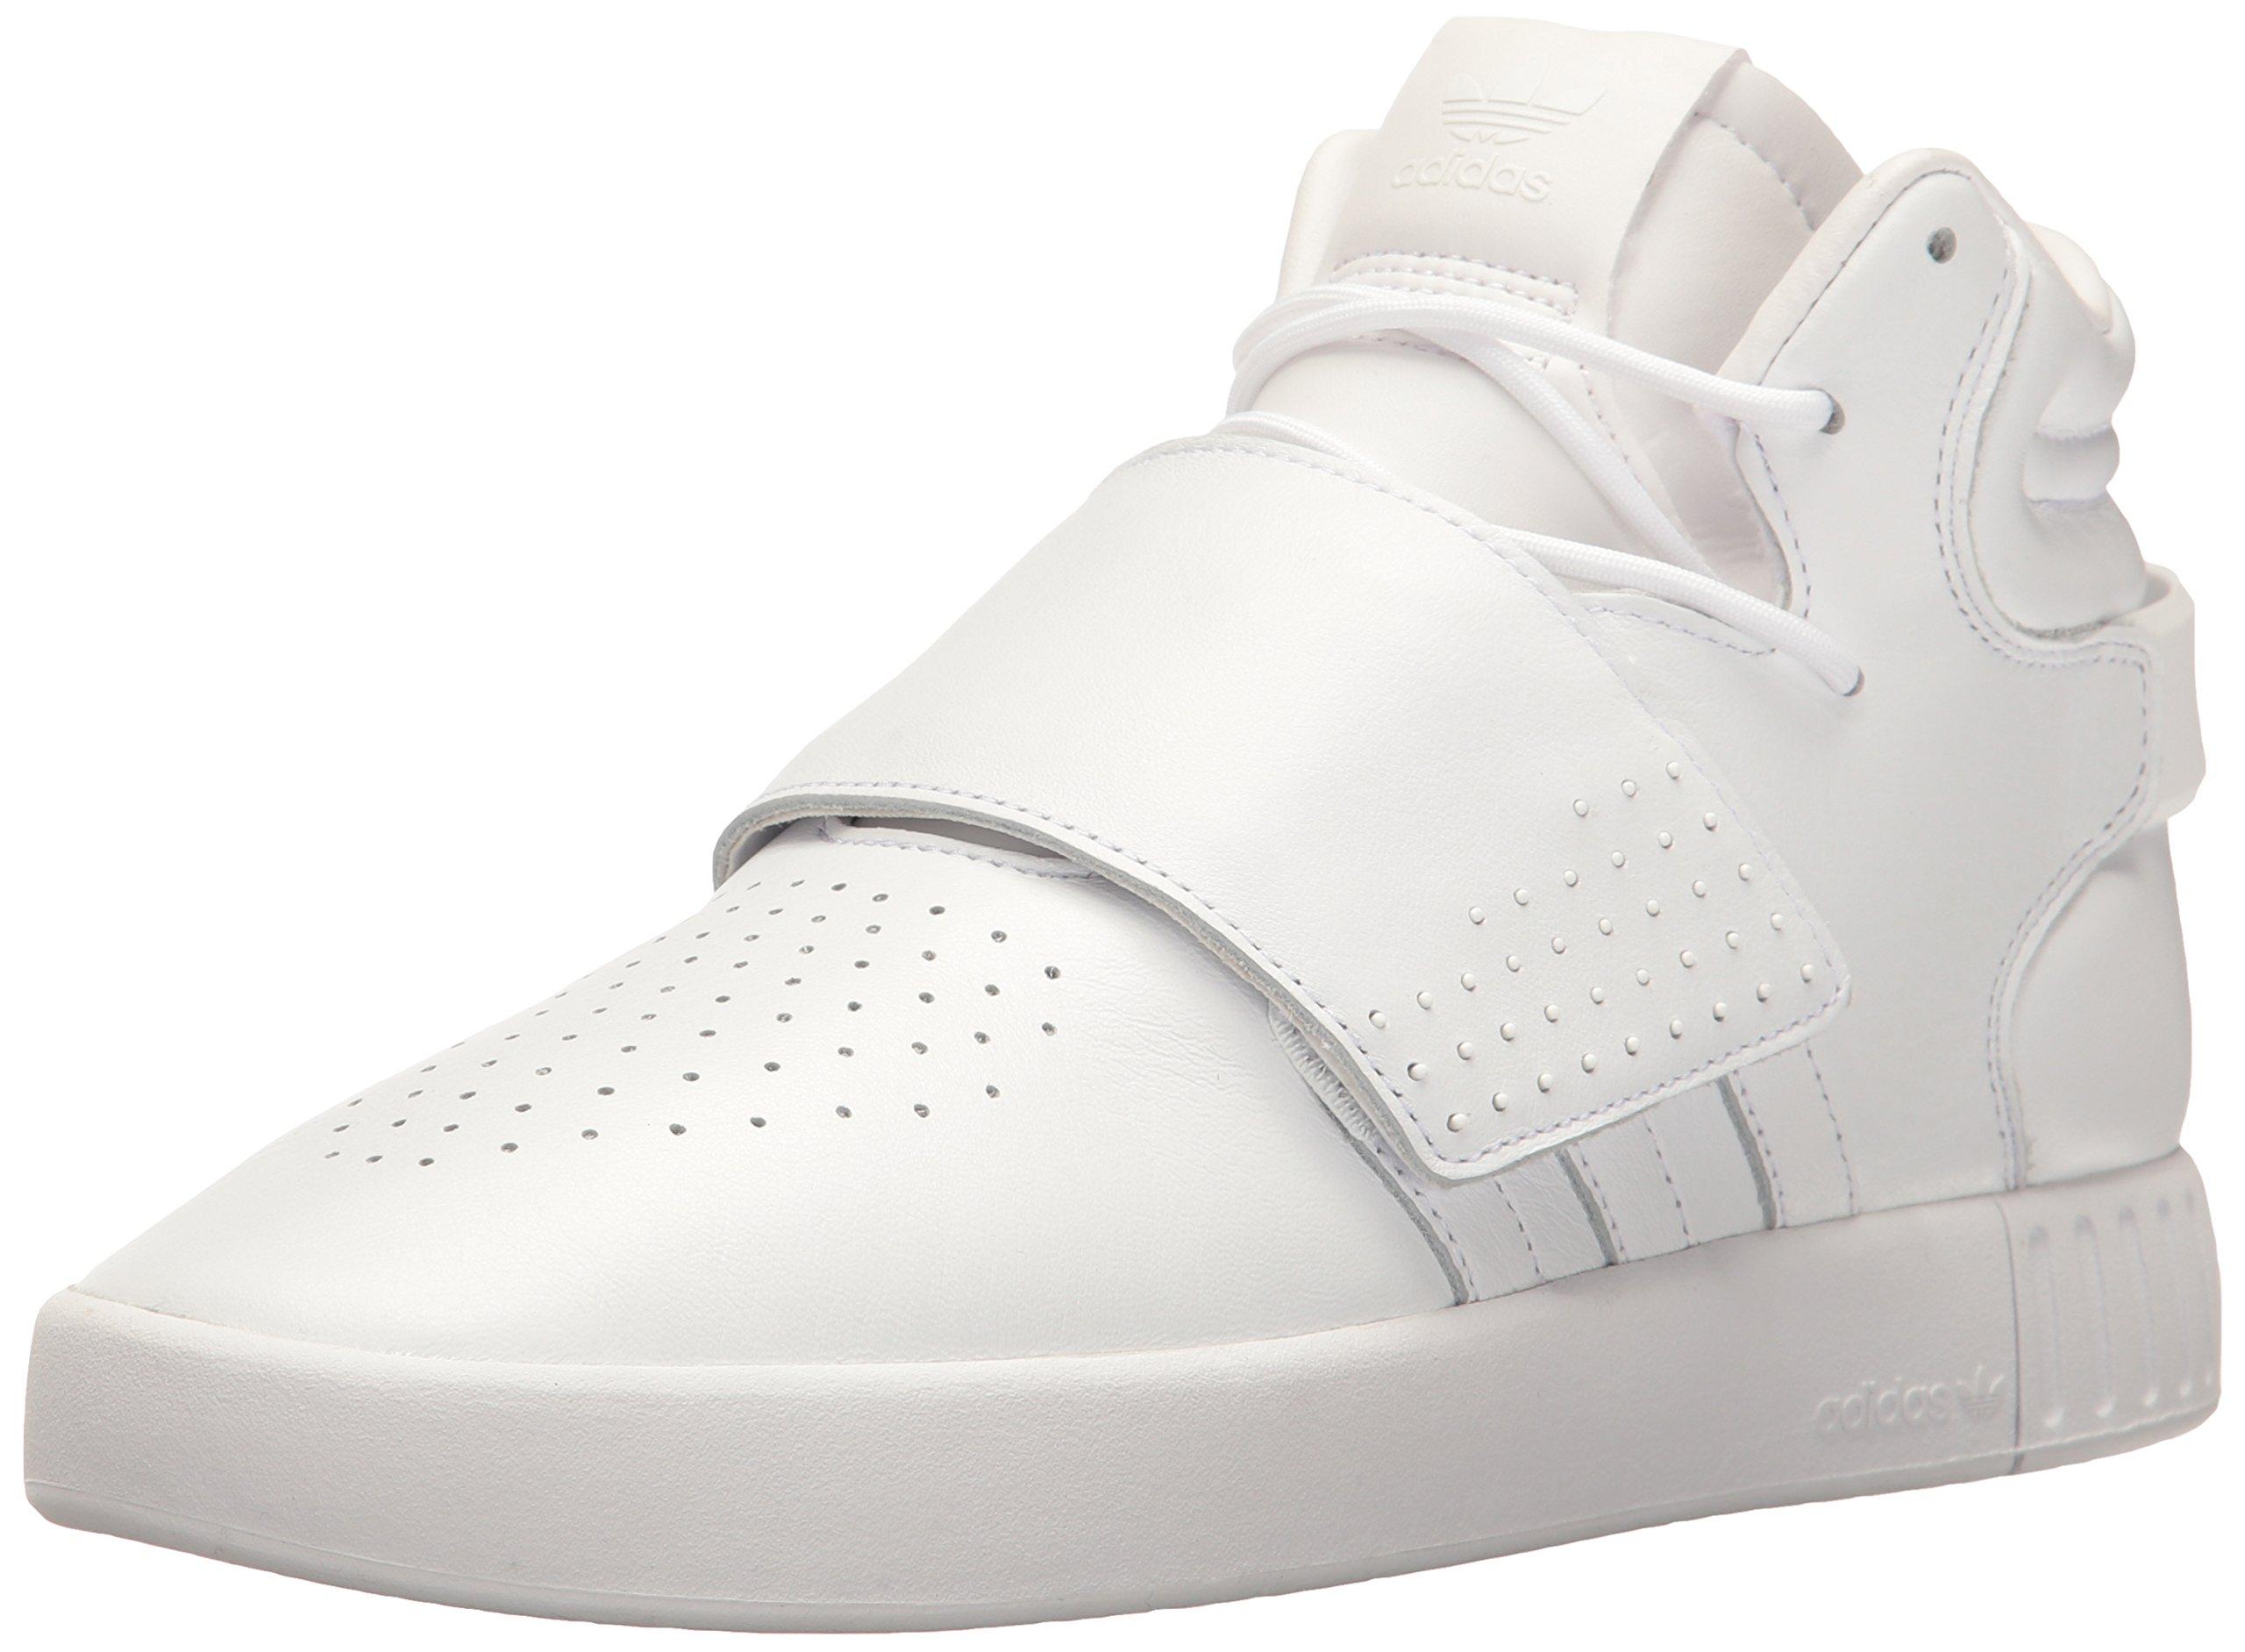 promo code 6f7ee fcac4 Galleon - Adidas Originals Men s Tubular Invader Strap Fashion Running Shoe,  White, ((9.5 M US)